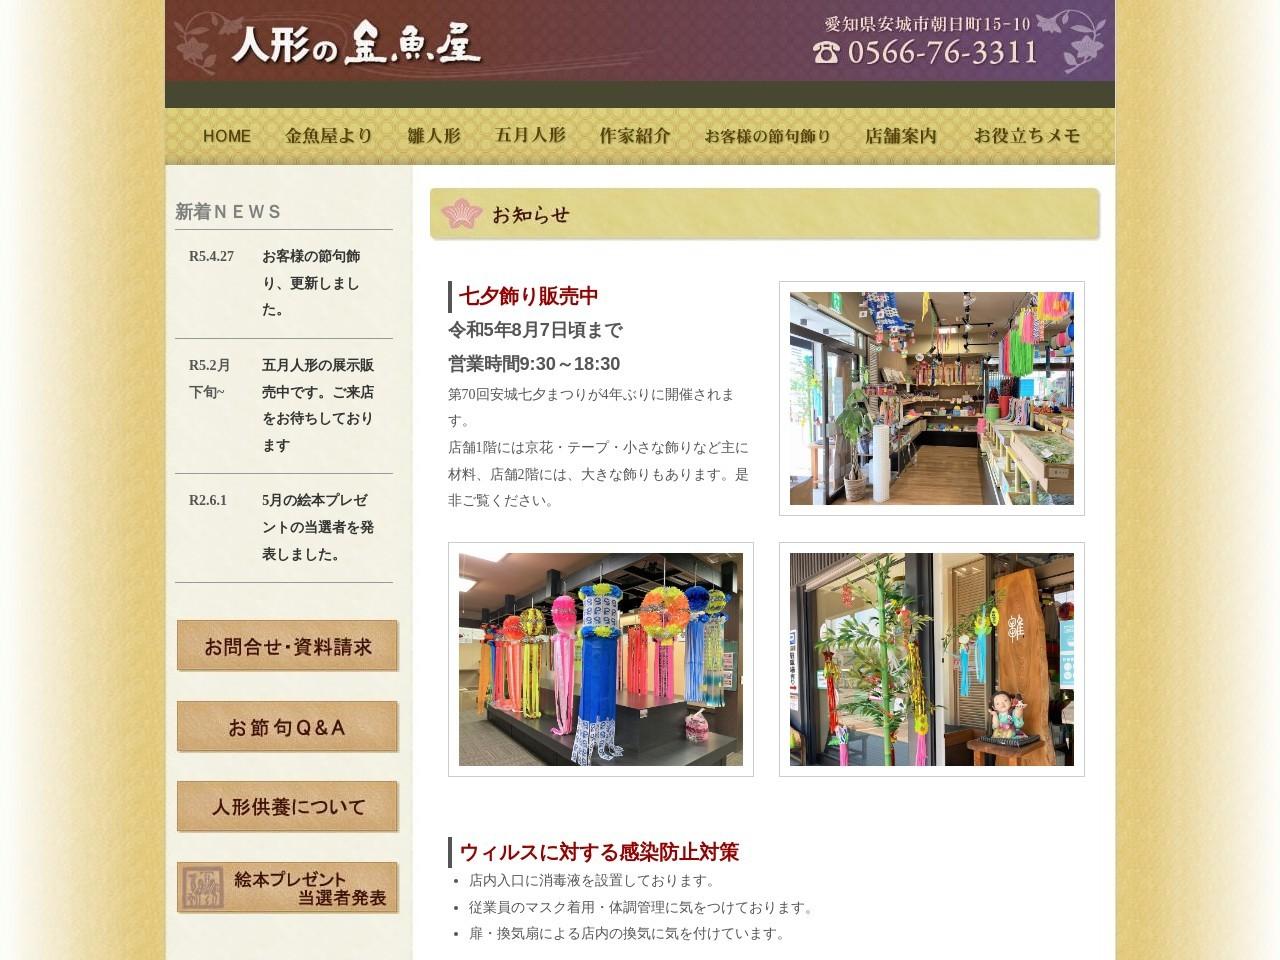 雛人形(ひな人形),五月人形の金魚屋 愛知県安城市,名古屋